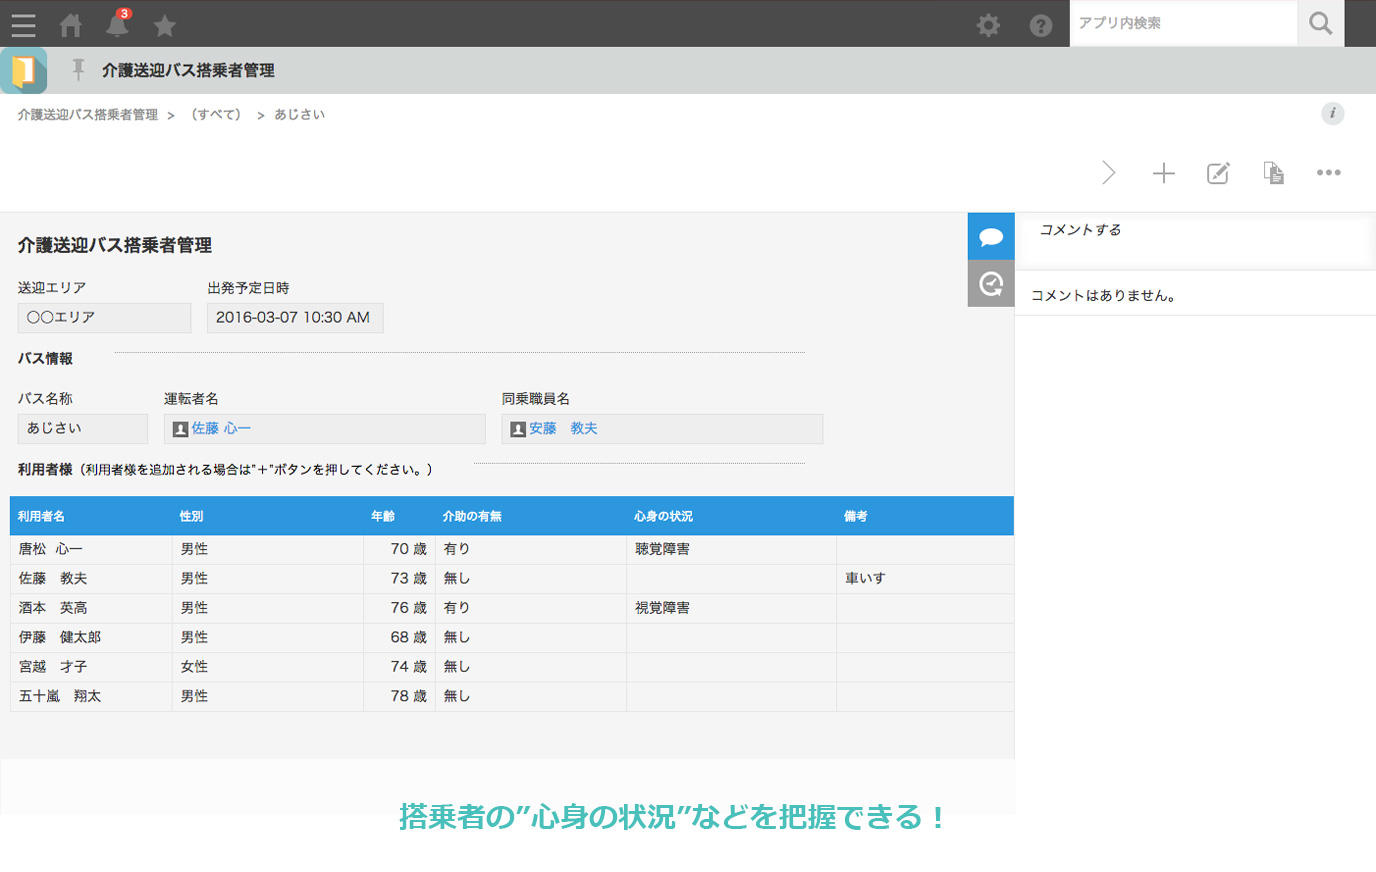 ktp_95_1.jpg